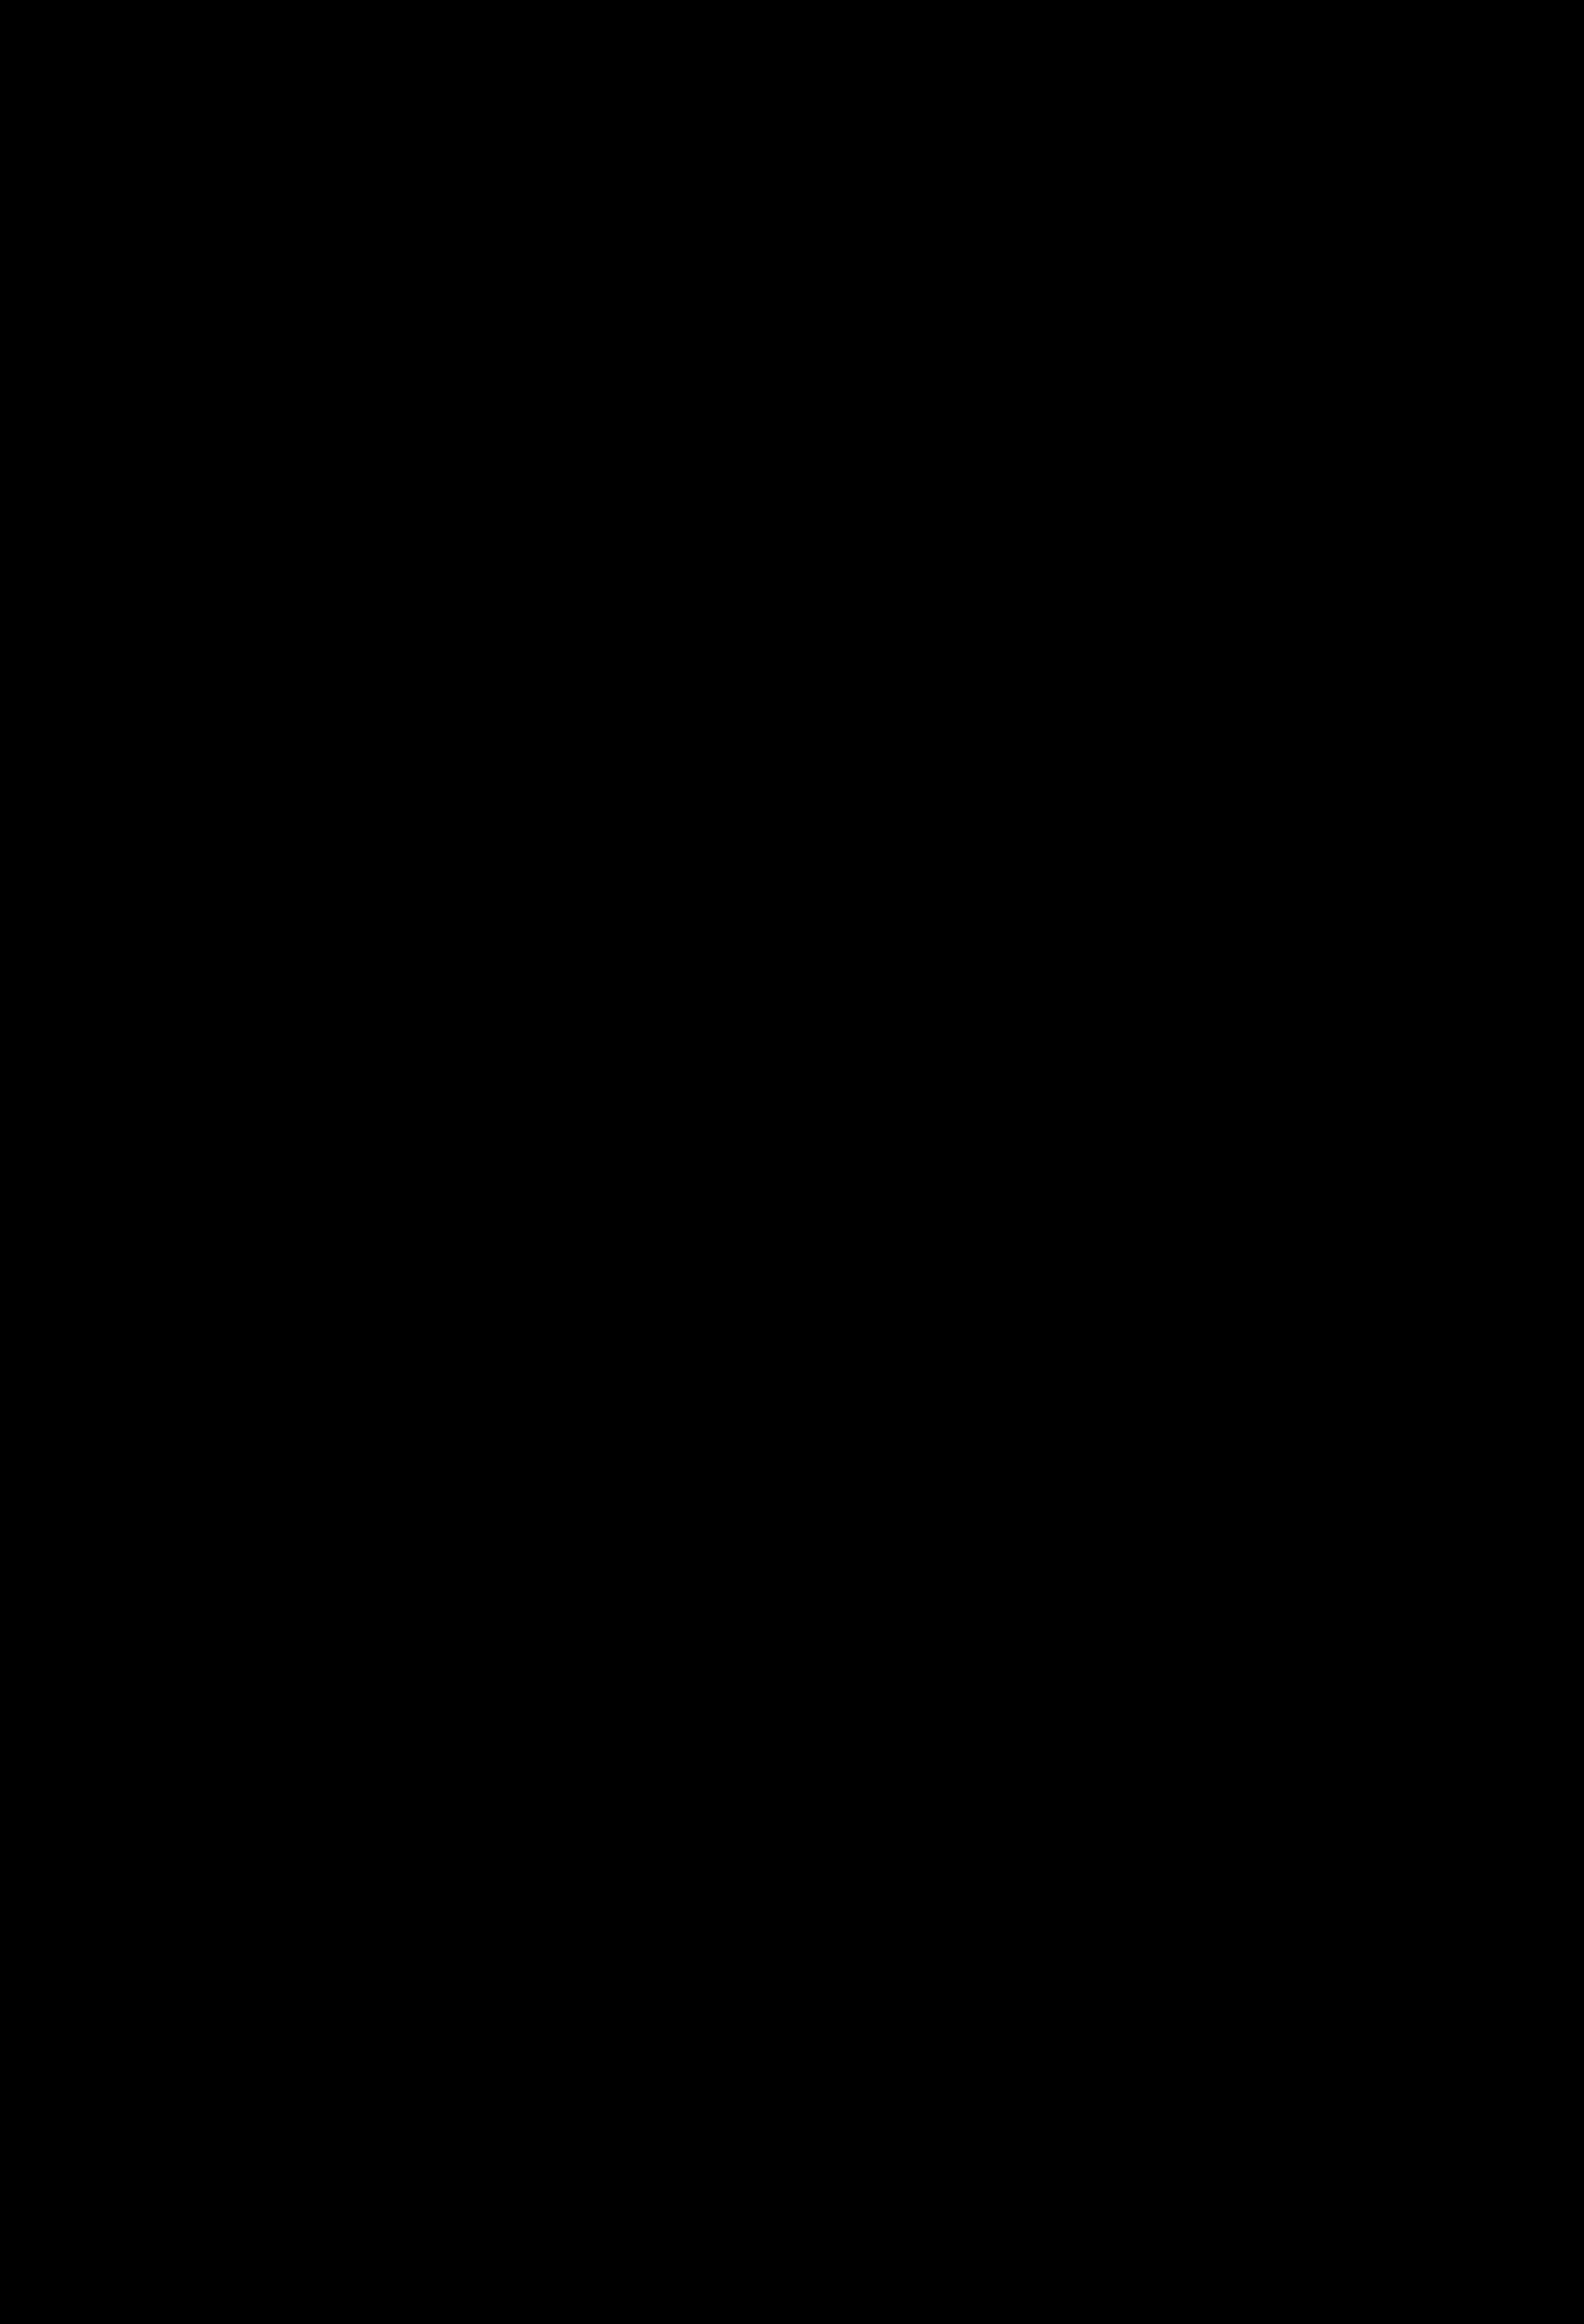 Garland clipart line drawing. Hawaiian lei at getdrawings